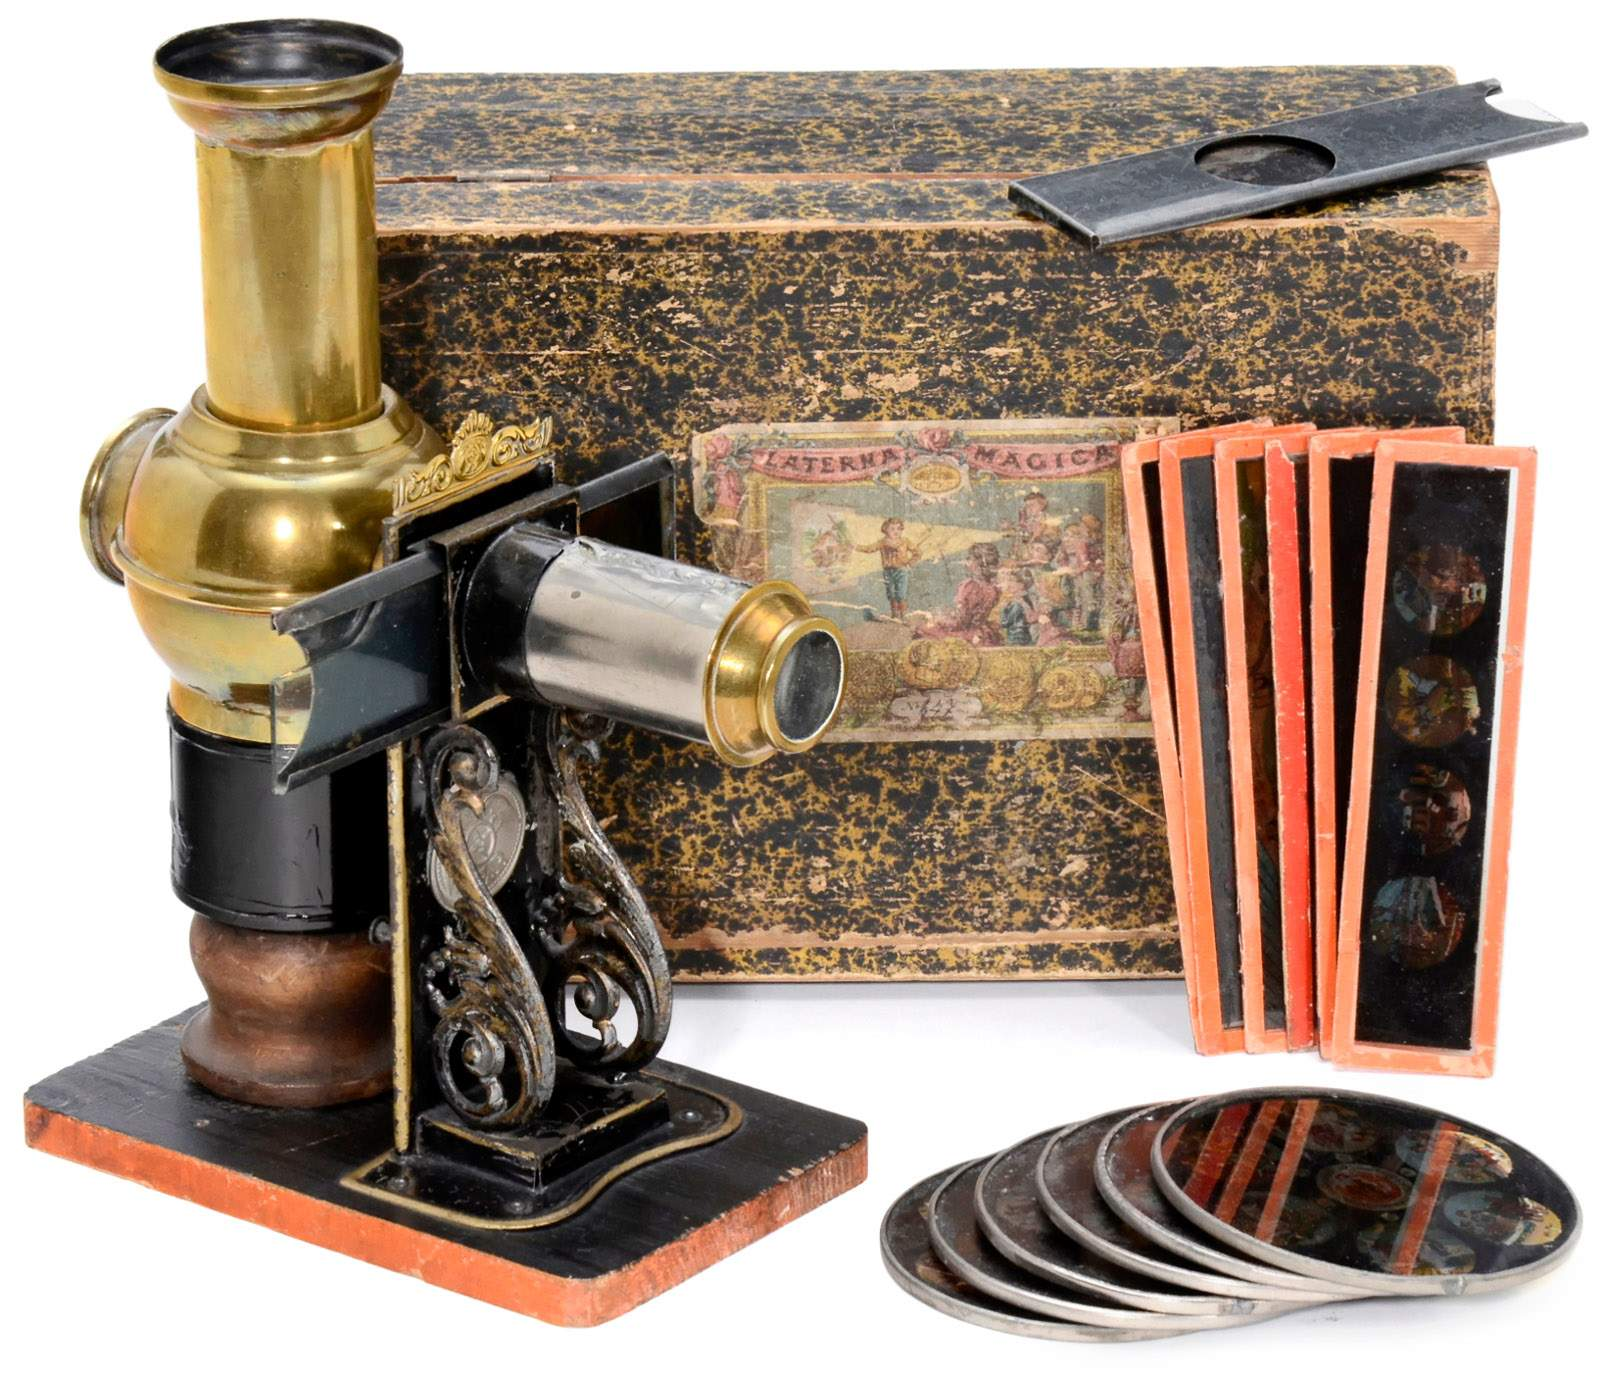 climax magic lantern by ernst plank c 1885 ernst plank nuremberg wonderful little magic lan. Black Bedroom Furniture Sets. Home Design Ideas